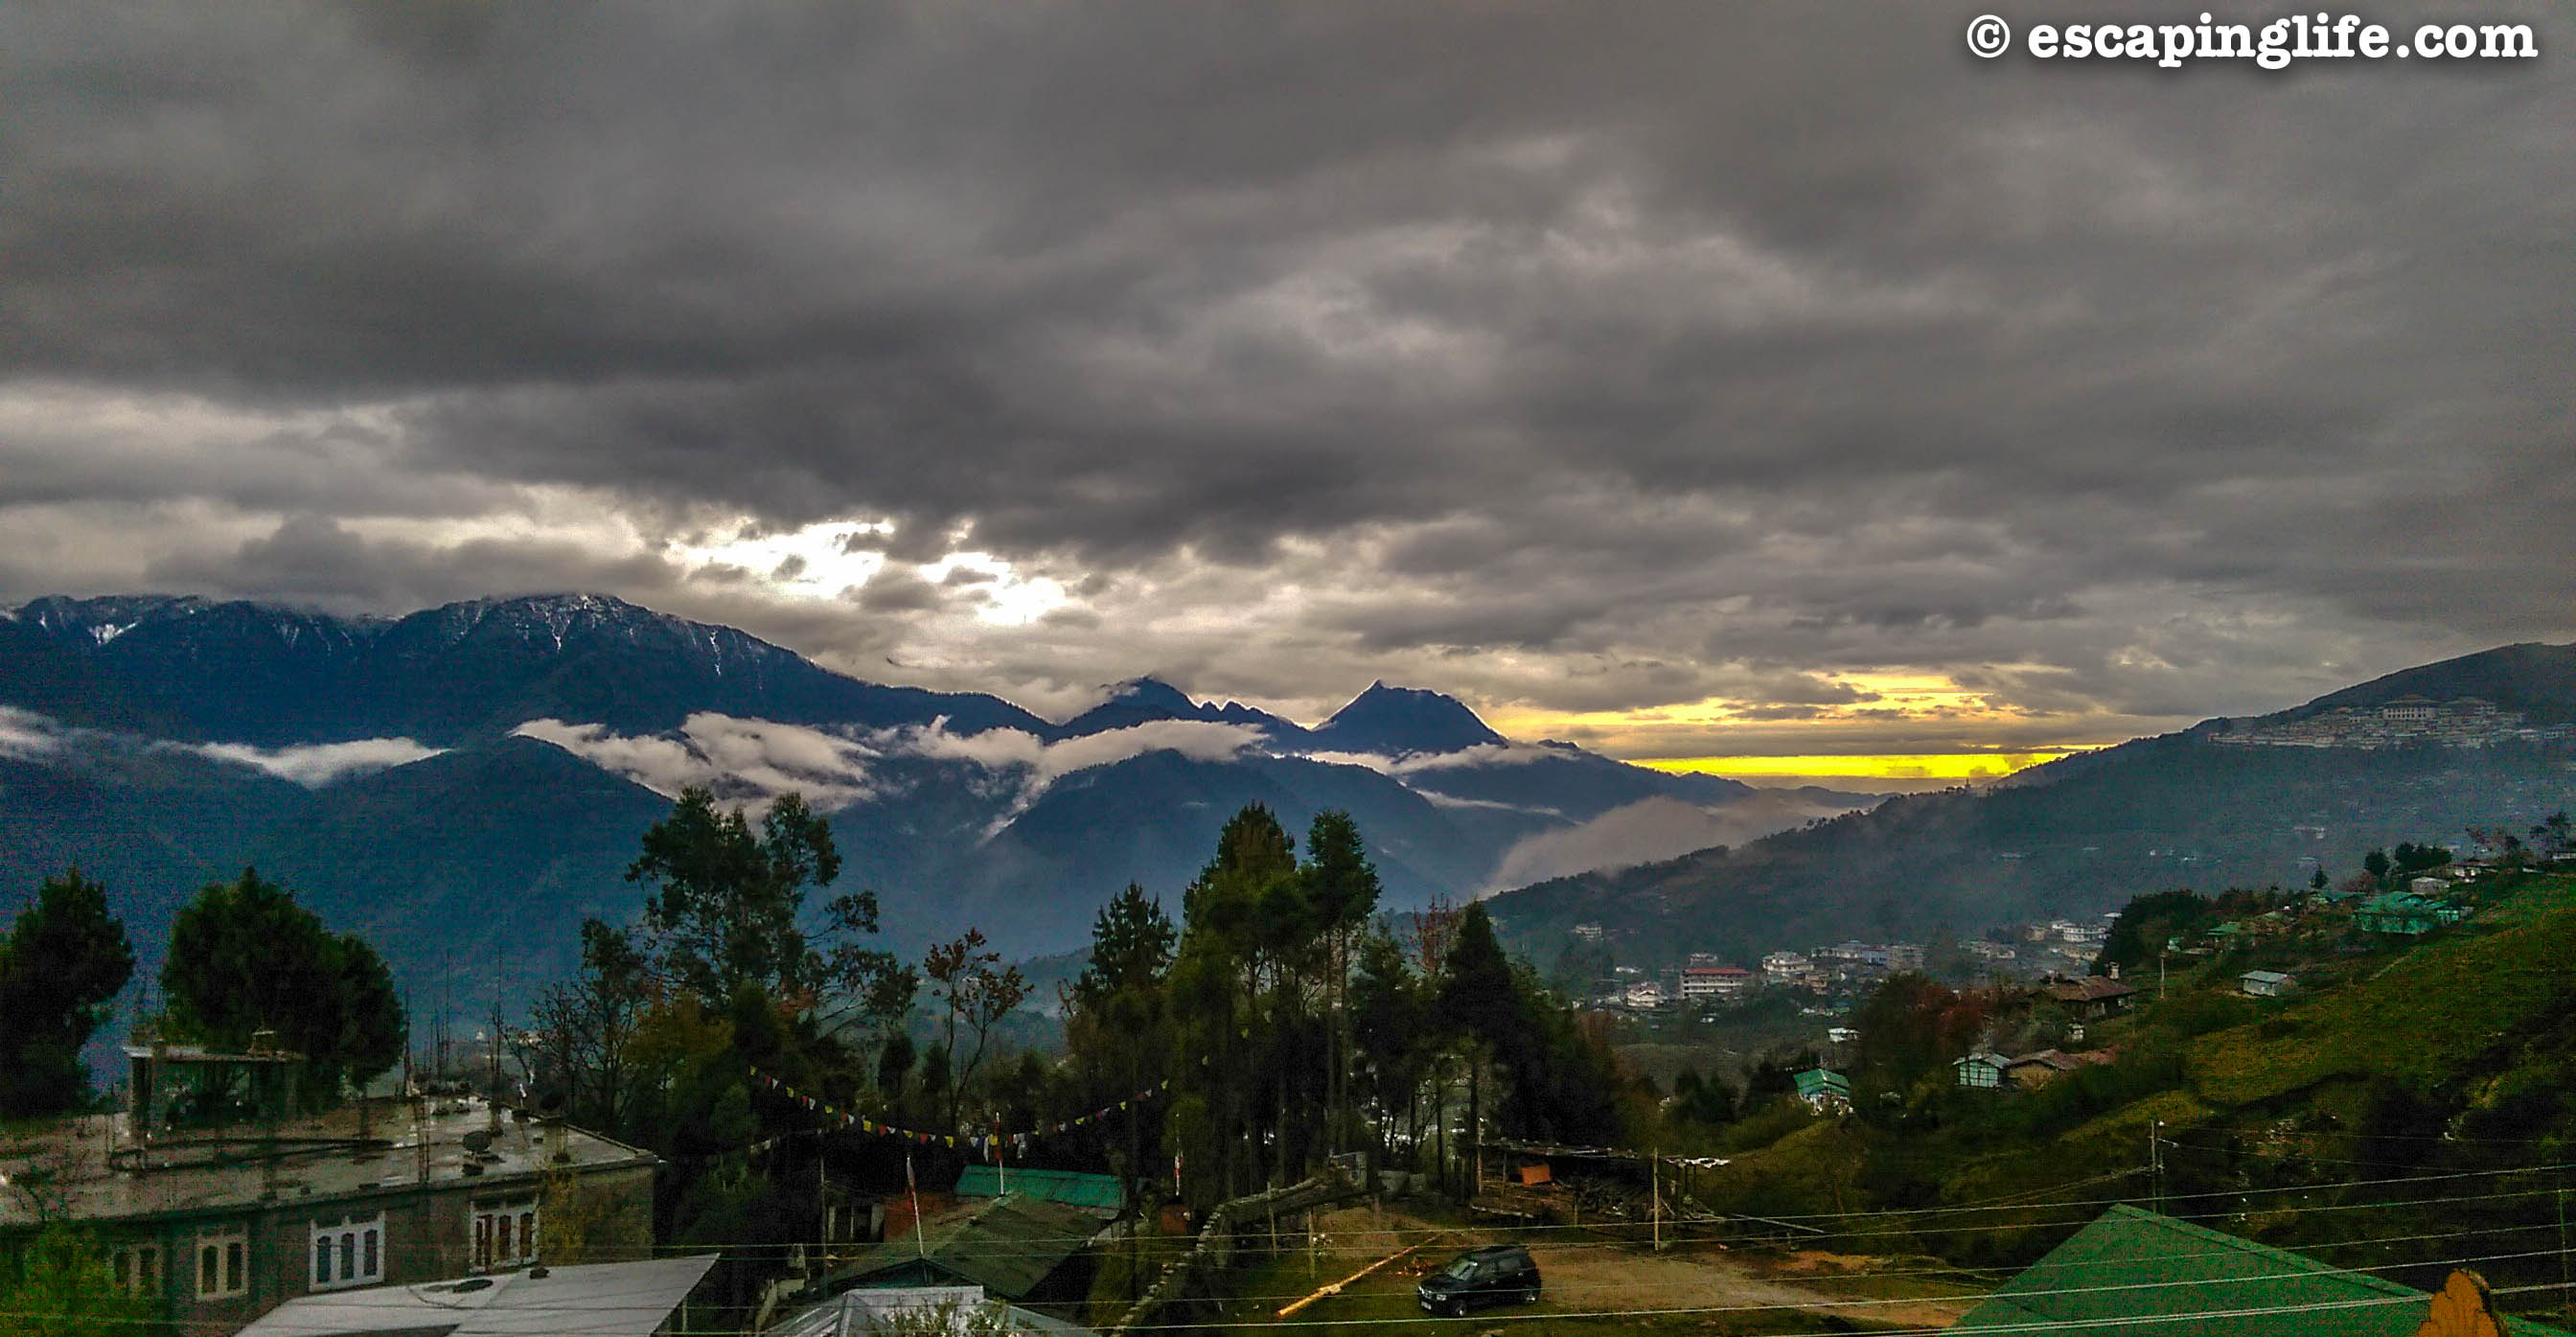 Sunset in Tawang